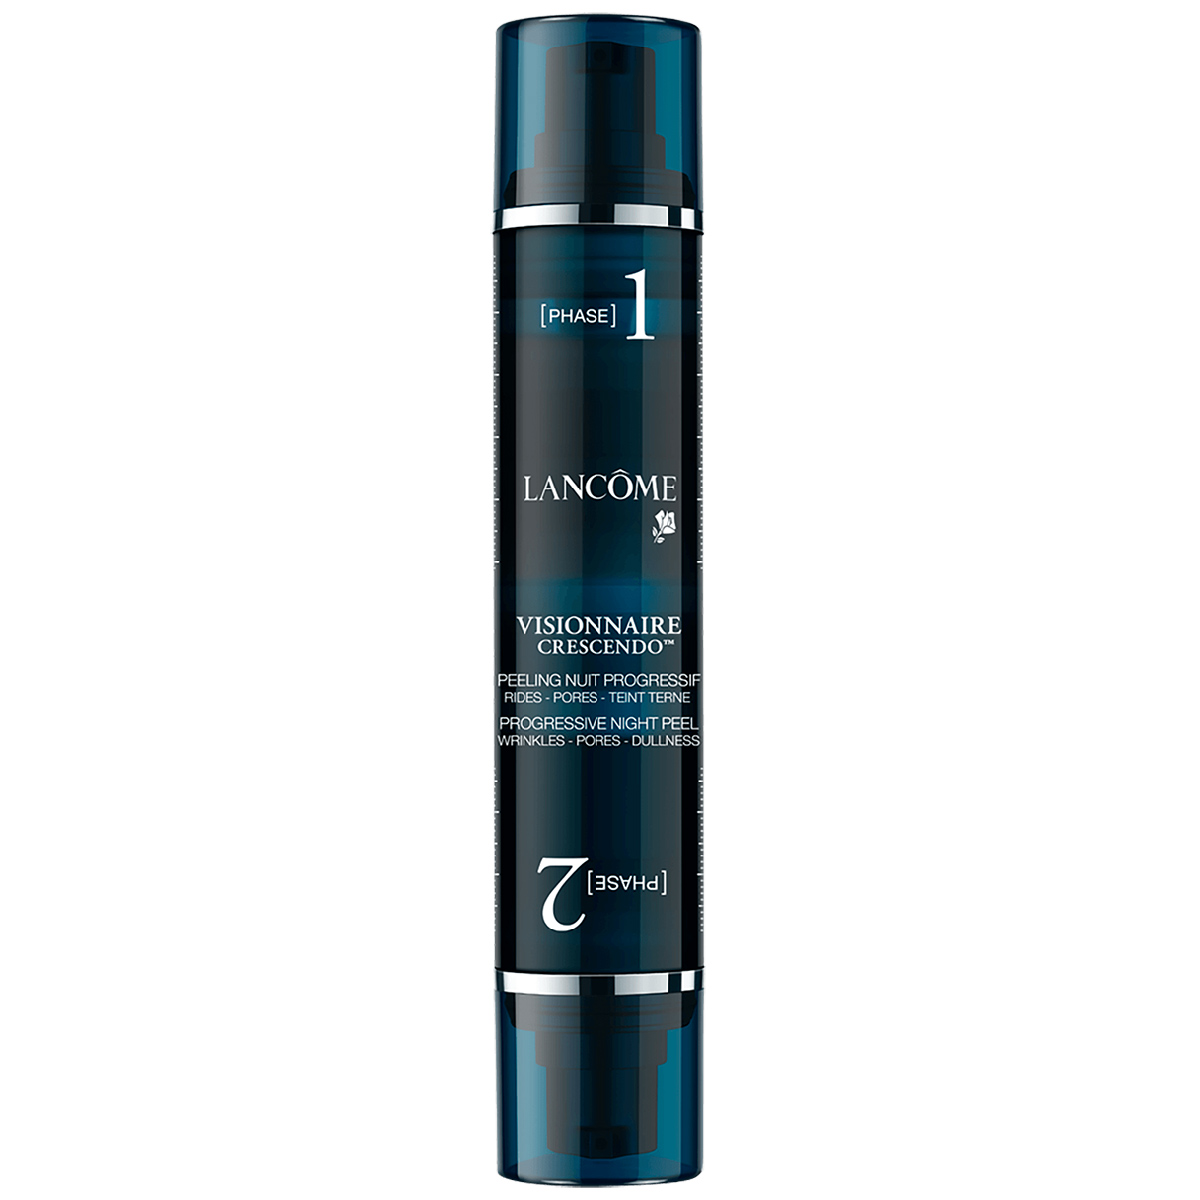 Lancôme - Visionnaire Crescendo - 30 ml